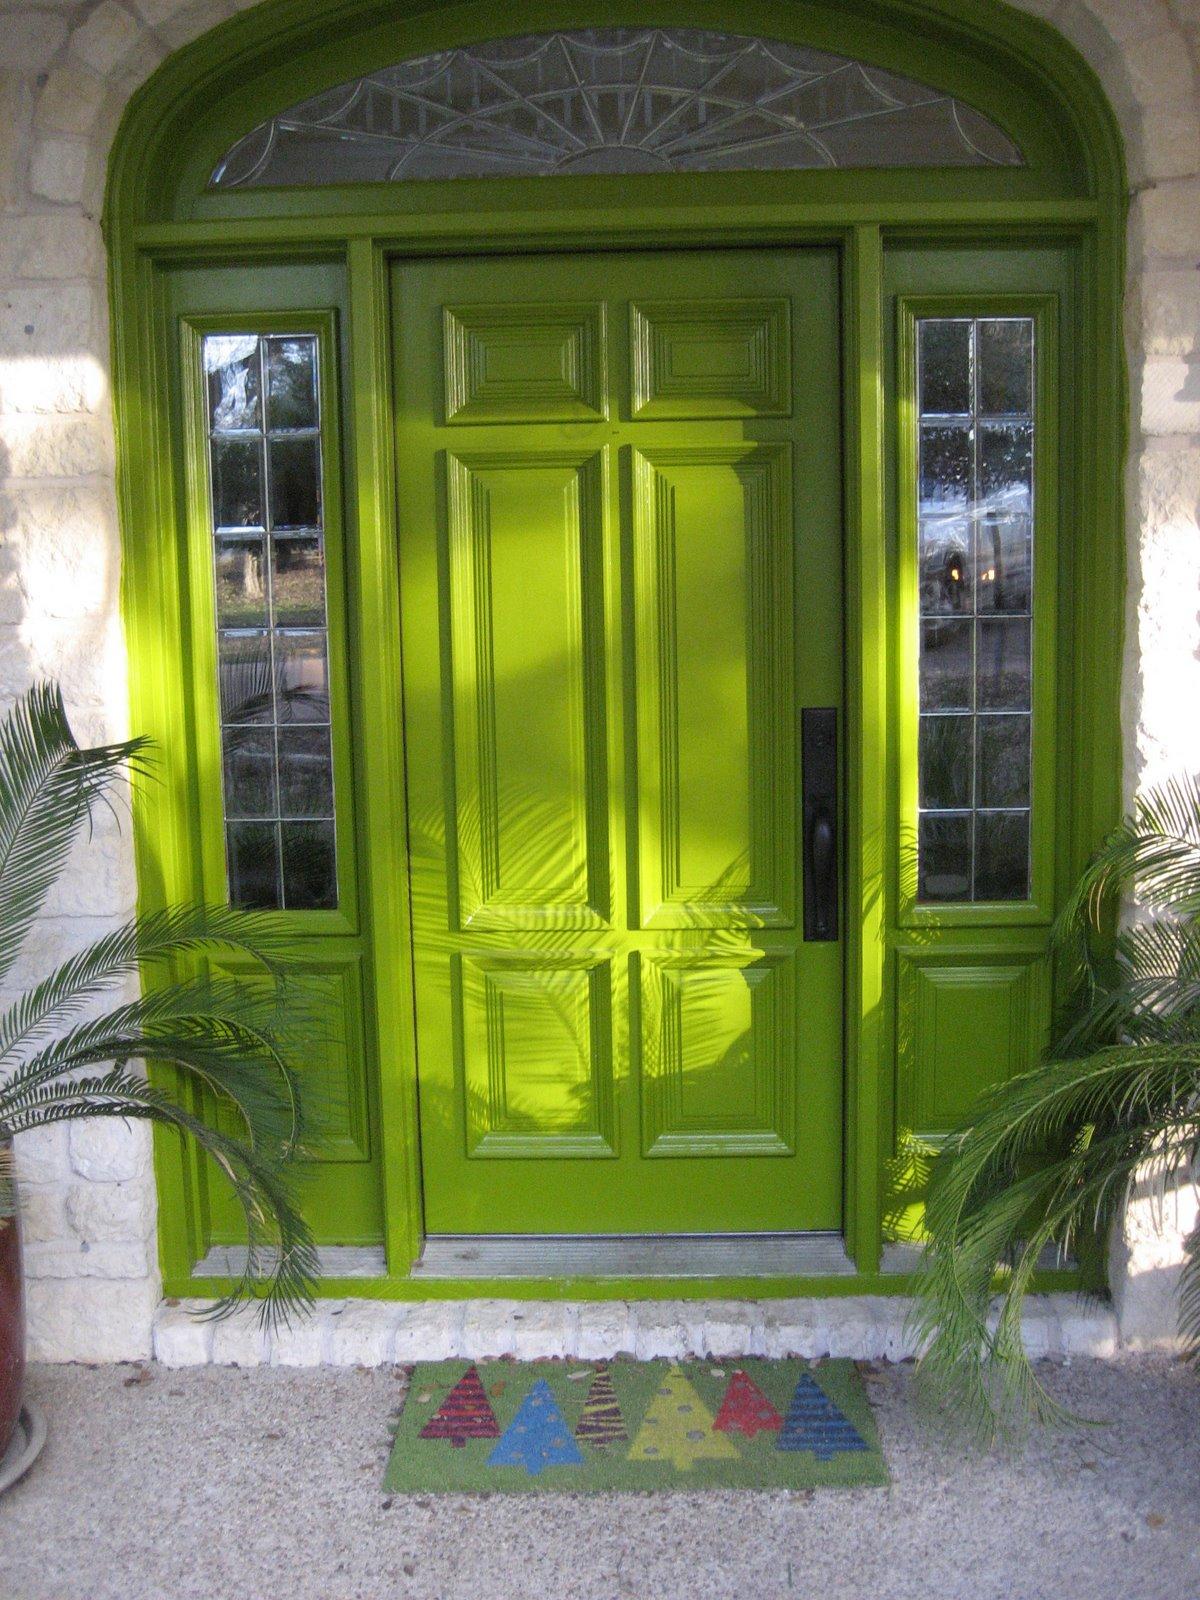 52 Beautiful Front Door Decorations and Designs Ideas ... on Door Color Ideas  id=66677